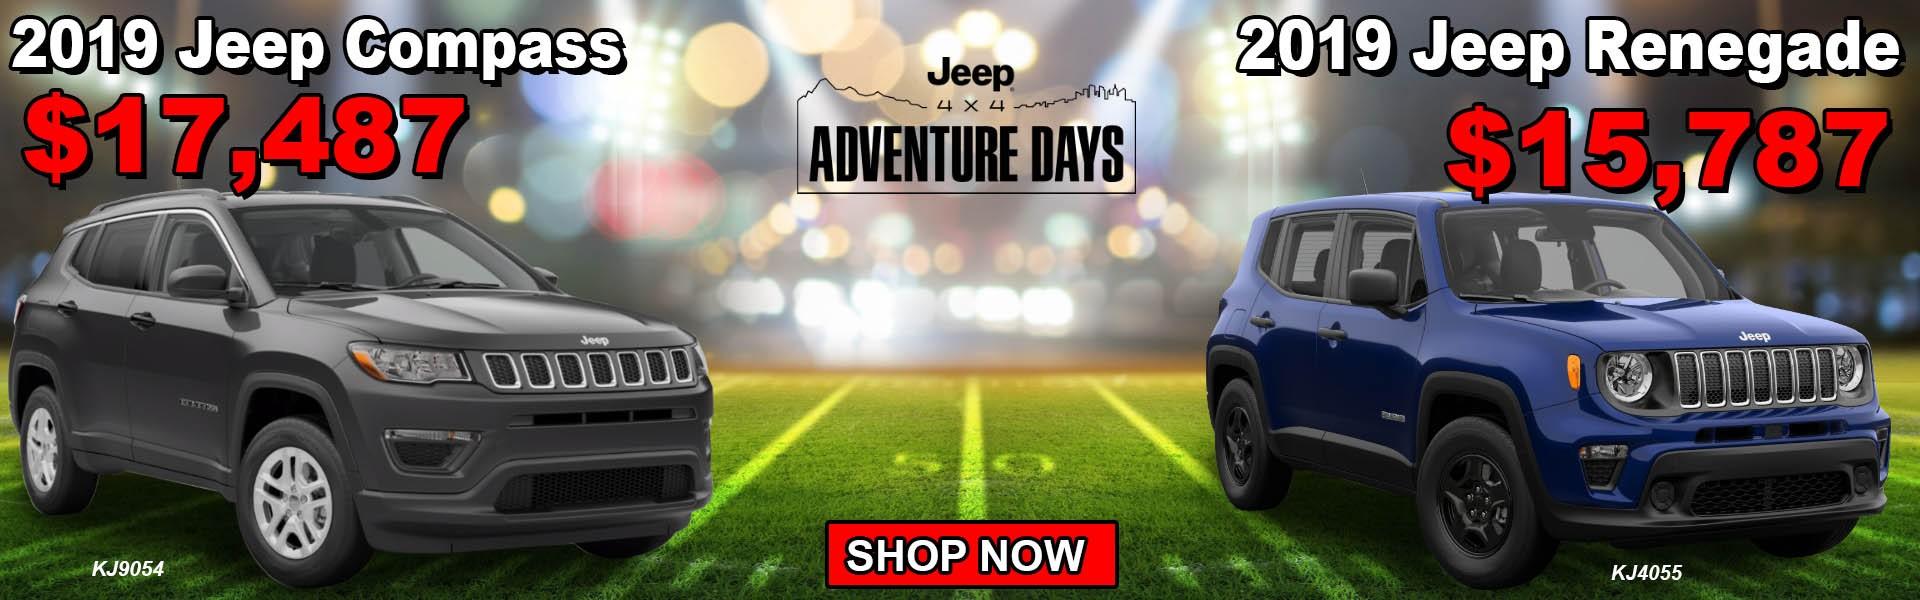 Sept 19 Jeep Compass Renegade